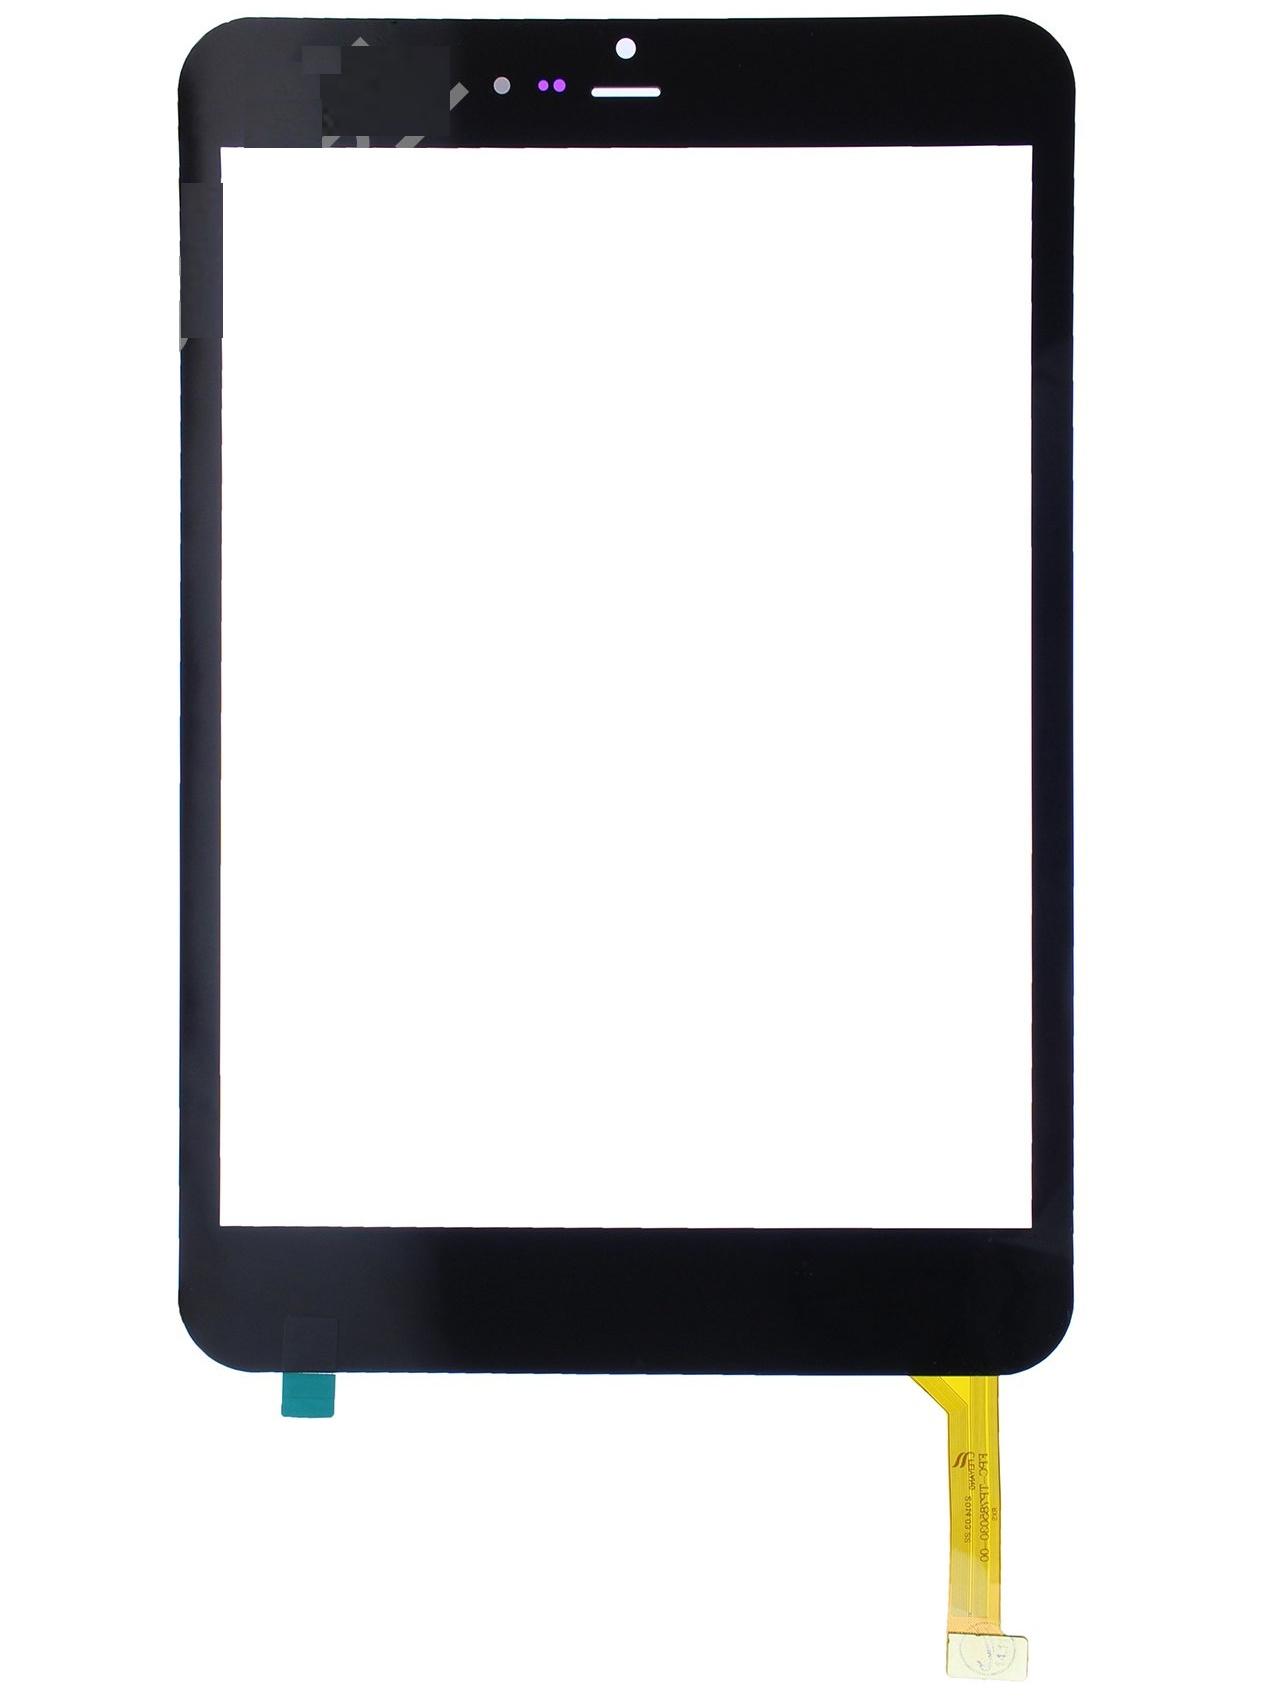 Тачскрин (сенсорная панель, стекло) для Oysters T82 3G - touch screen